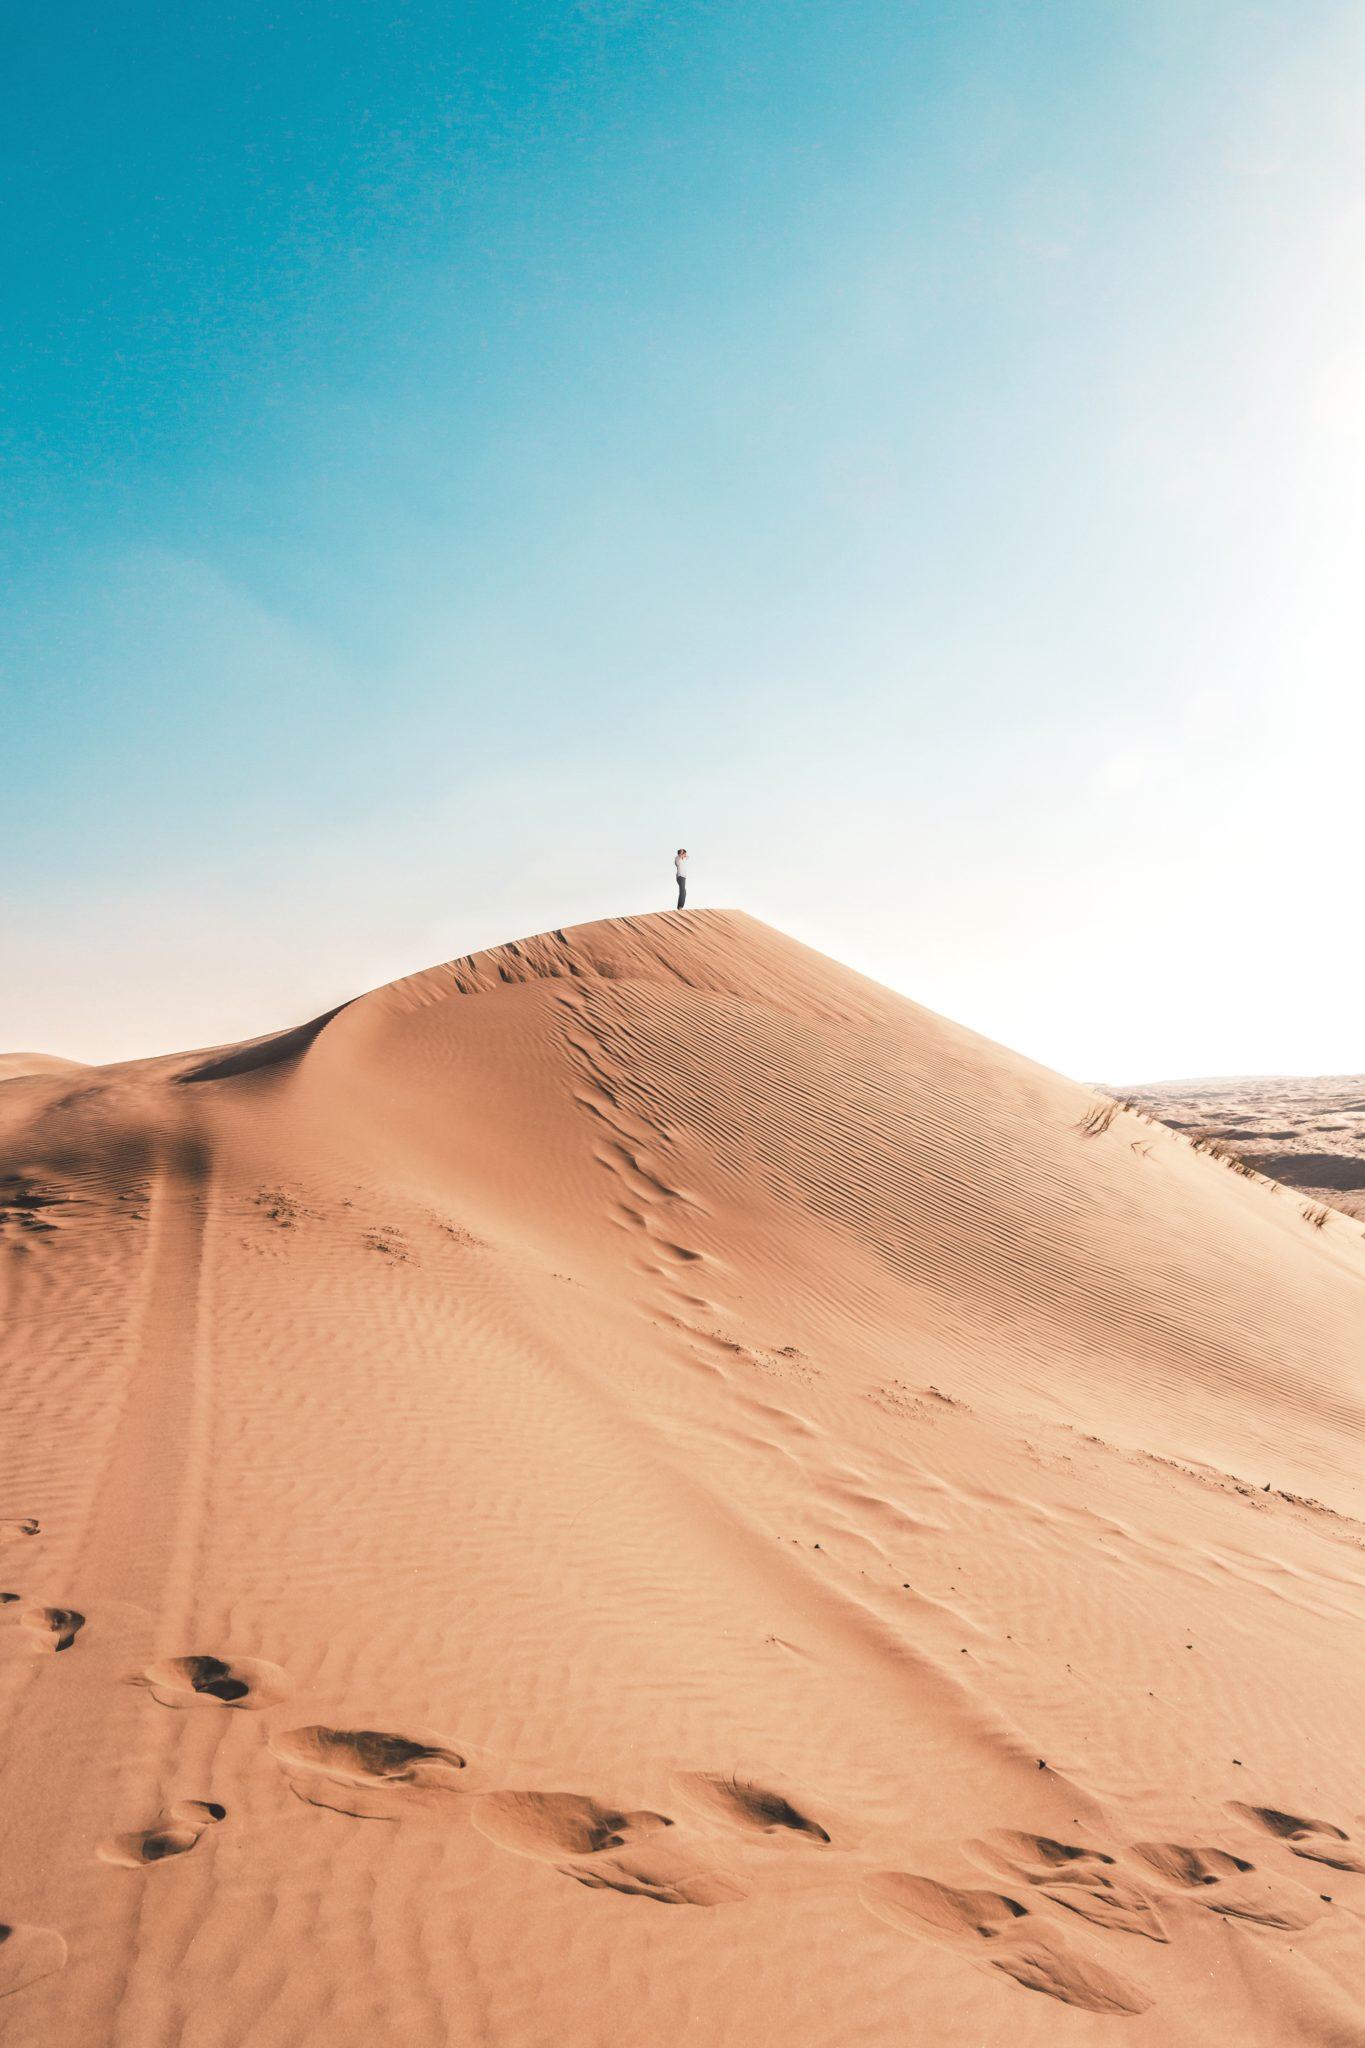 Oman deserts